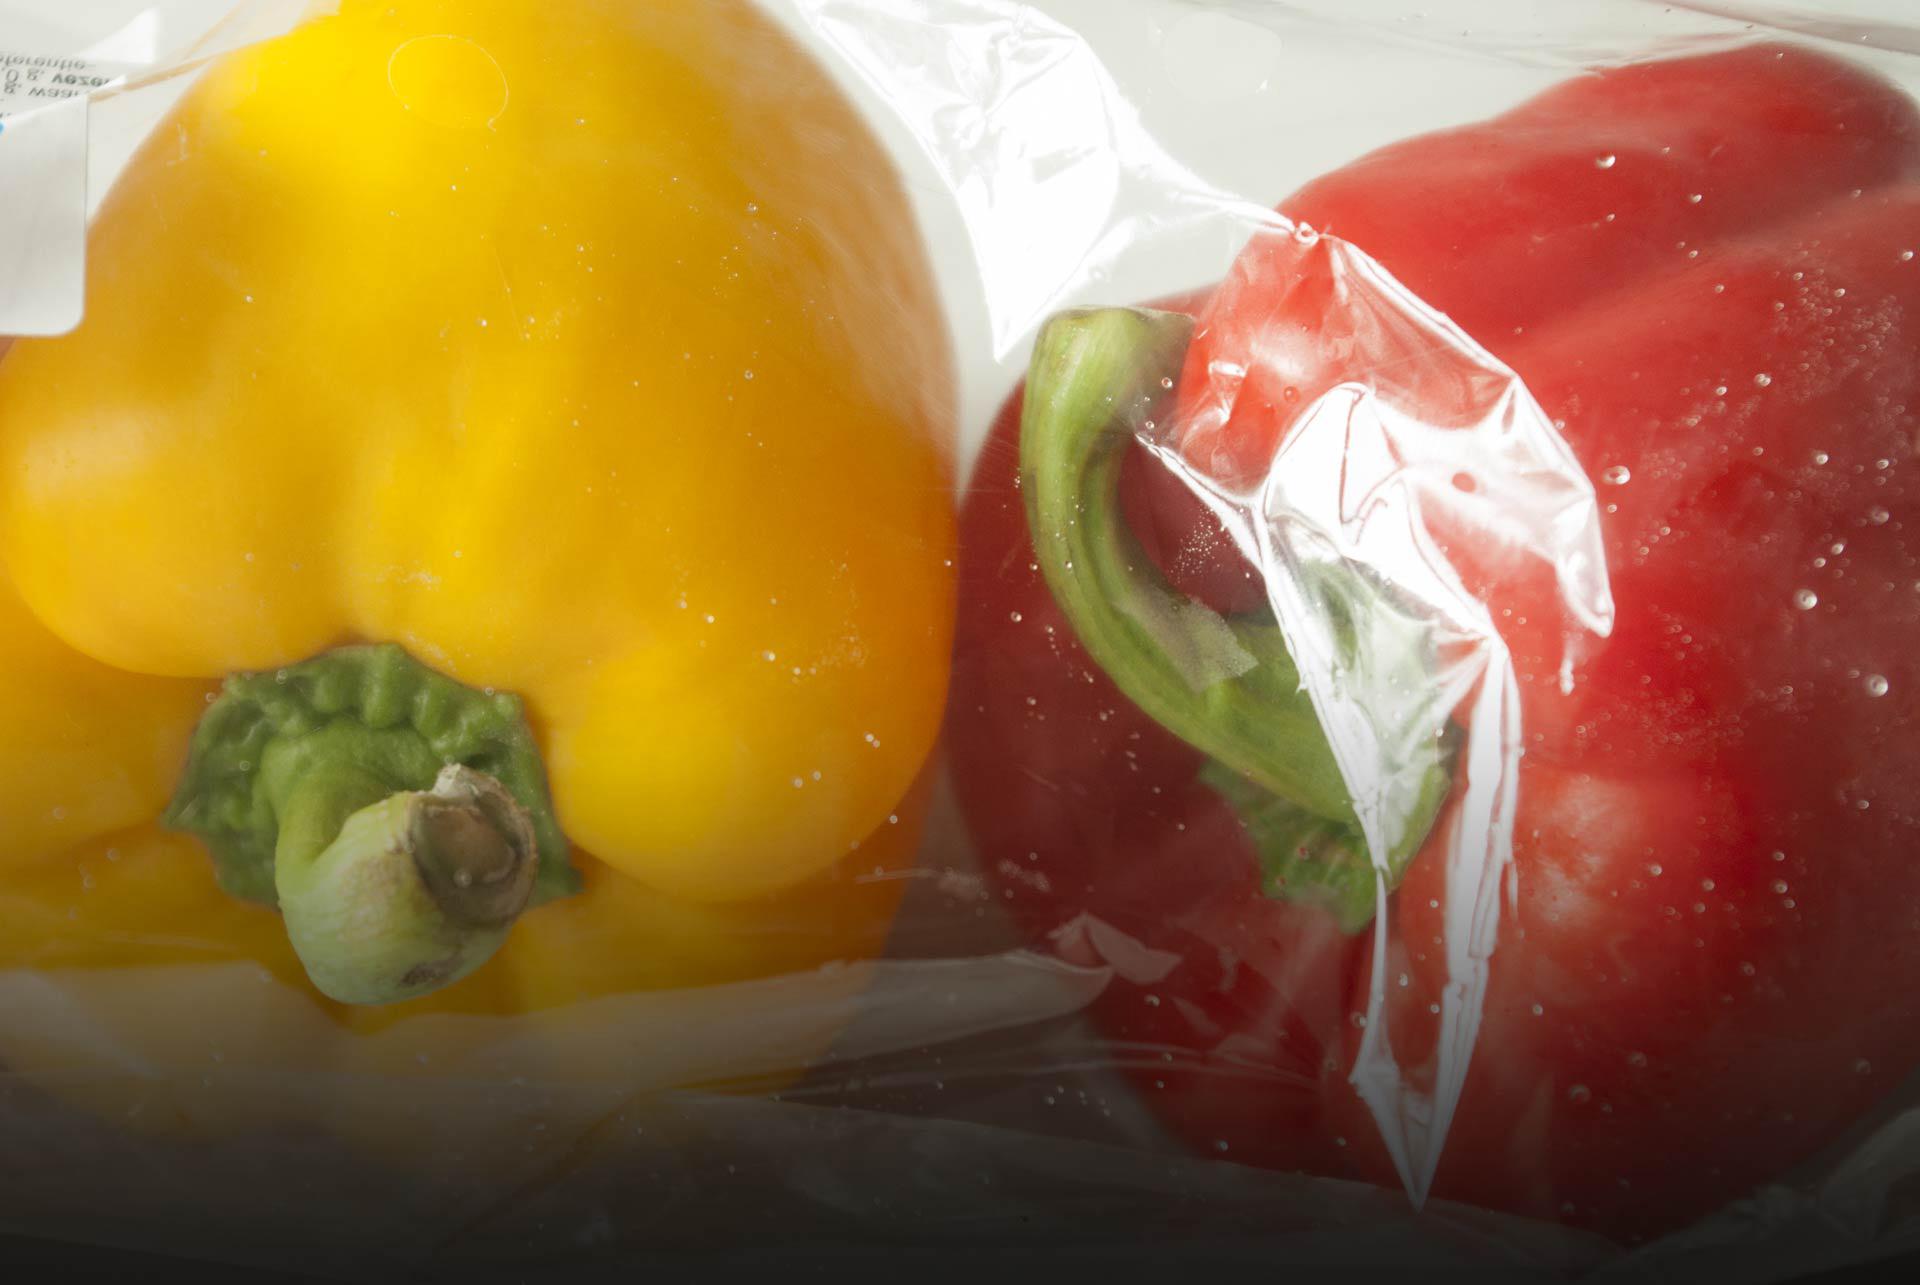 Paprika's in plastic verpakt